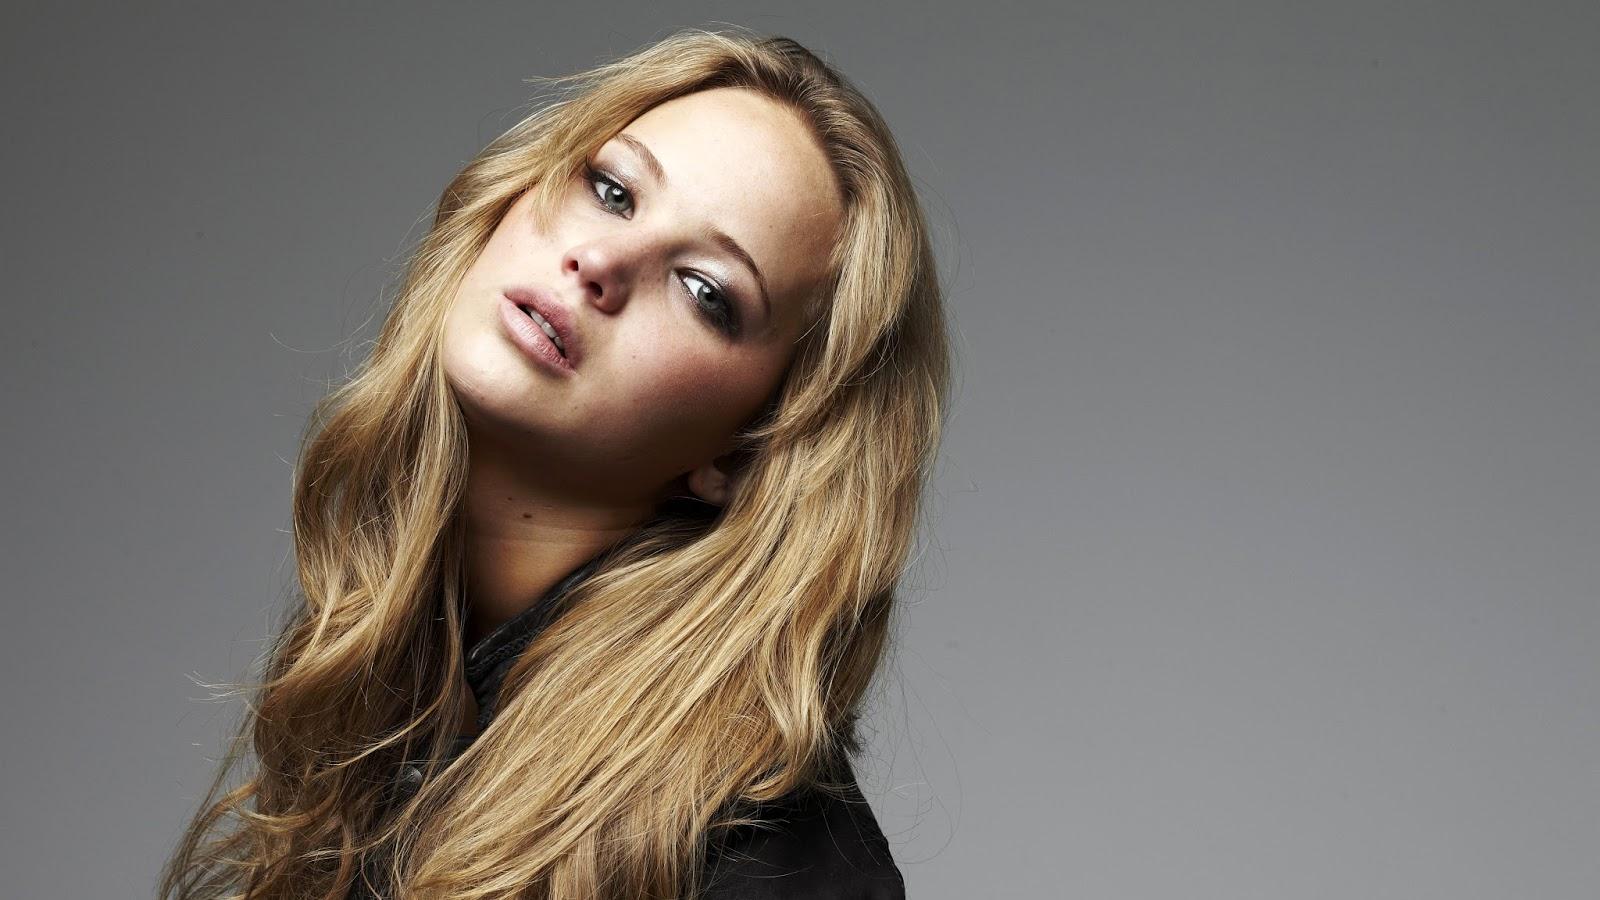 Jennifer Lawrence Hot Hd Photos  Wallpaper - Hd Images -9725